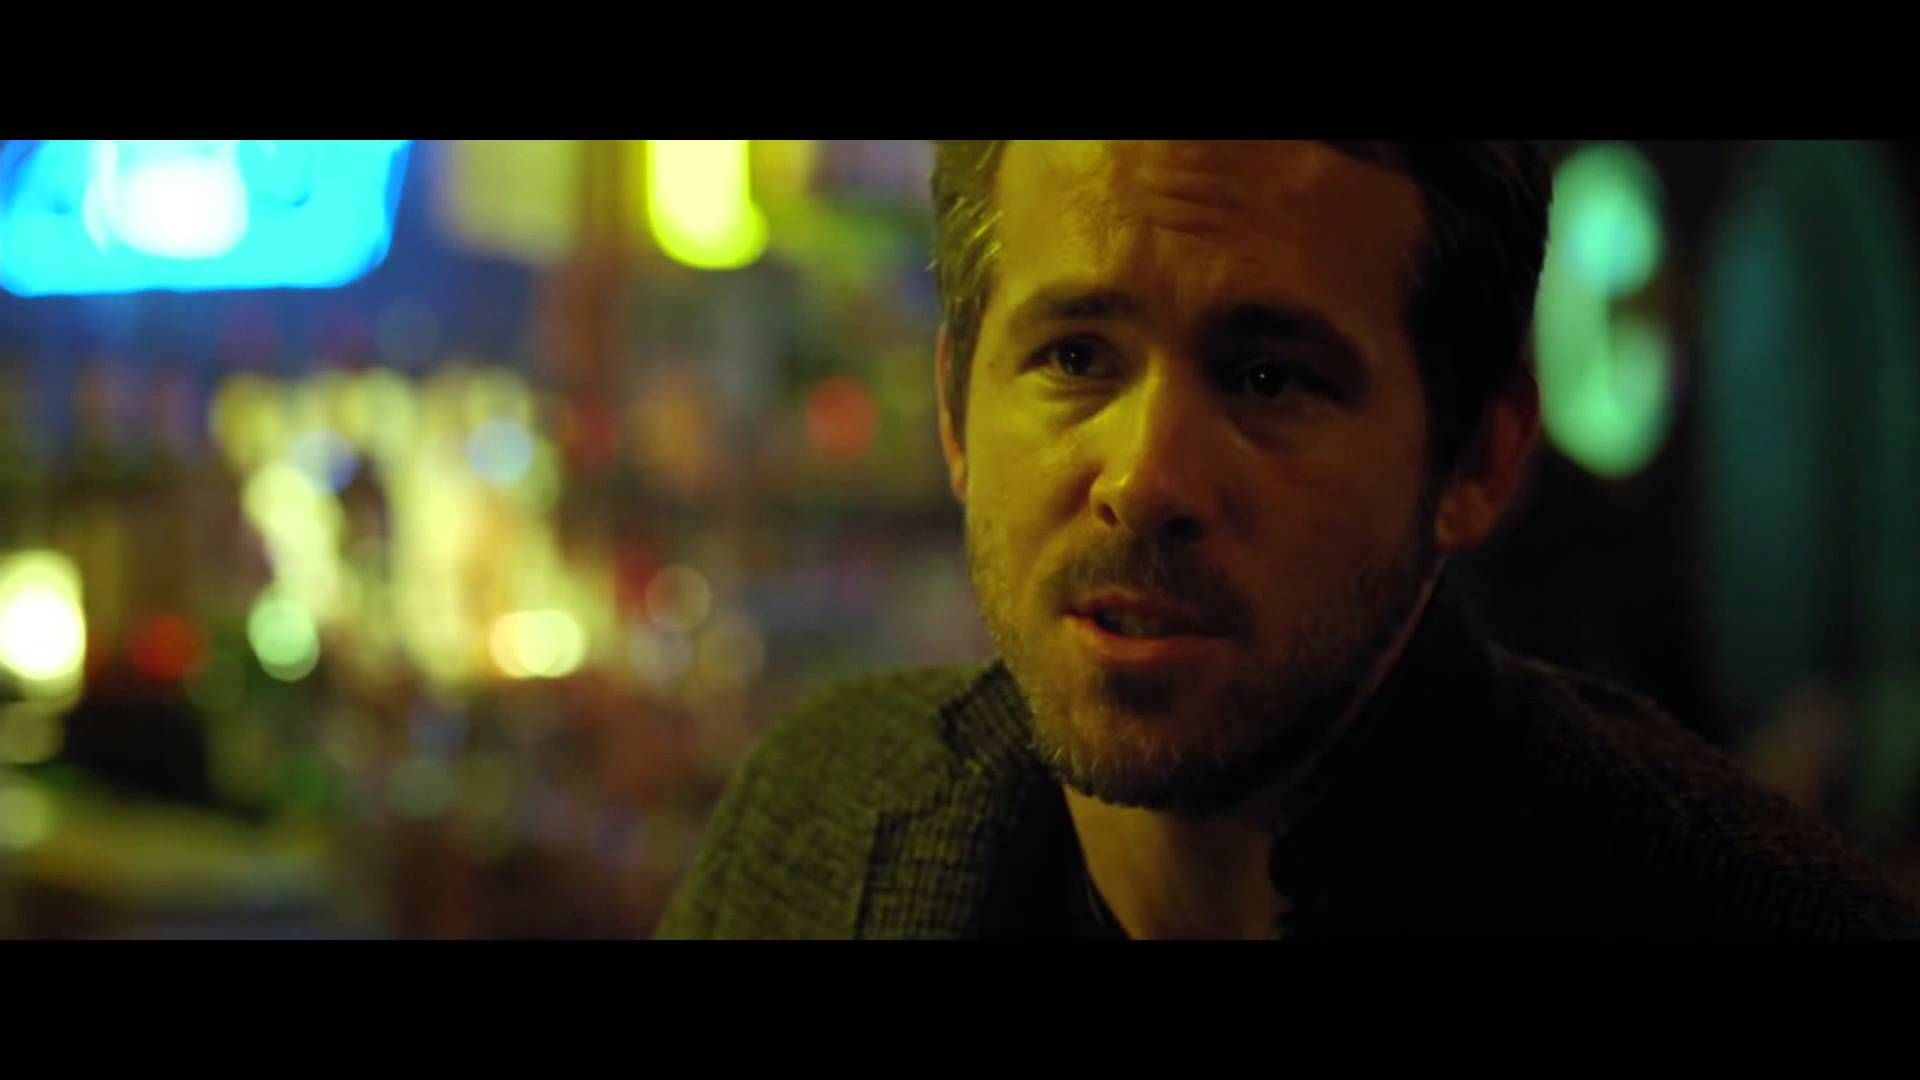 Mississippi Grind Trailer Movie 2015 - Official Trailer HD